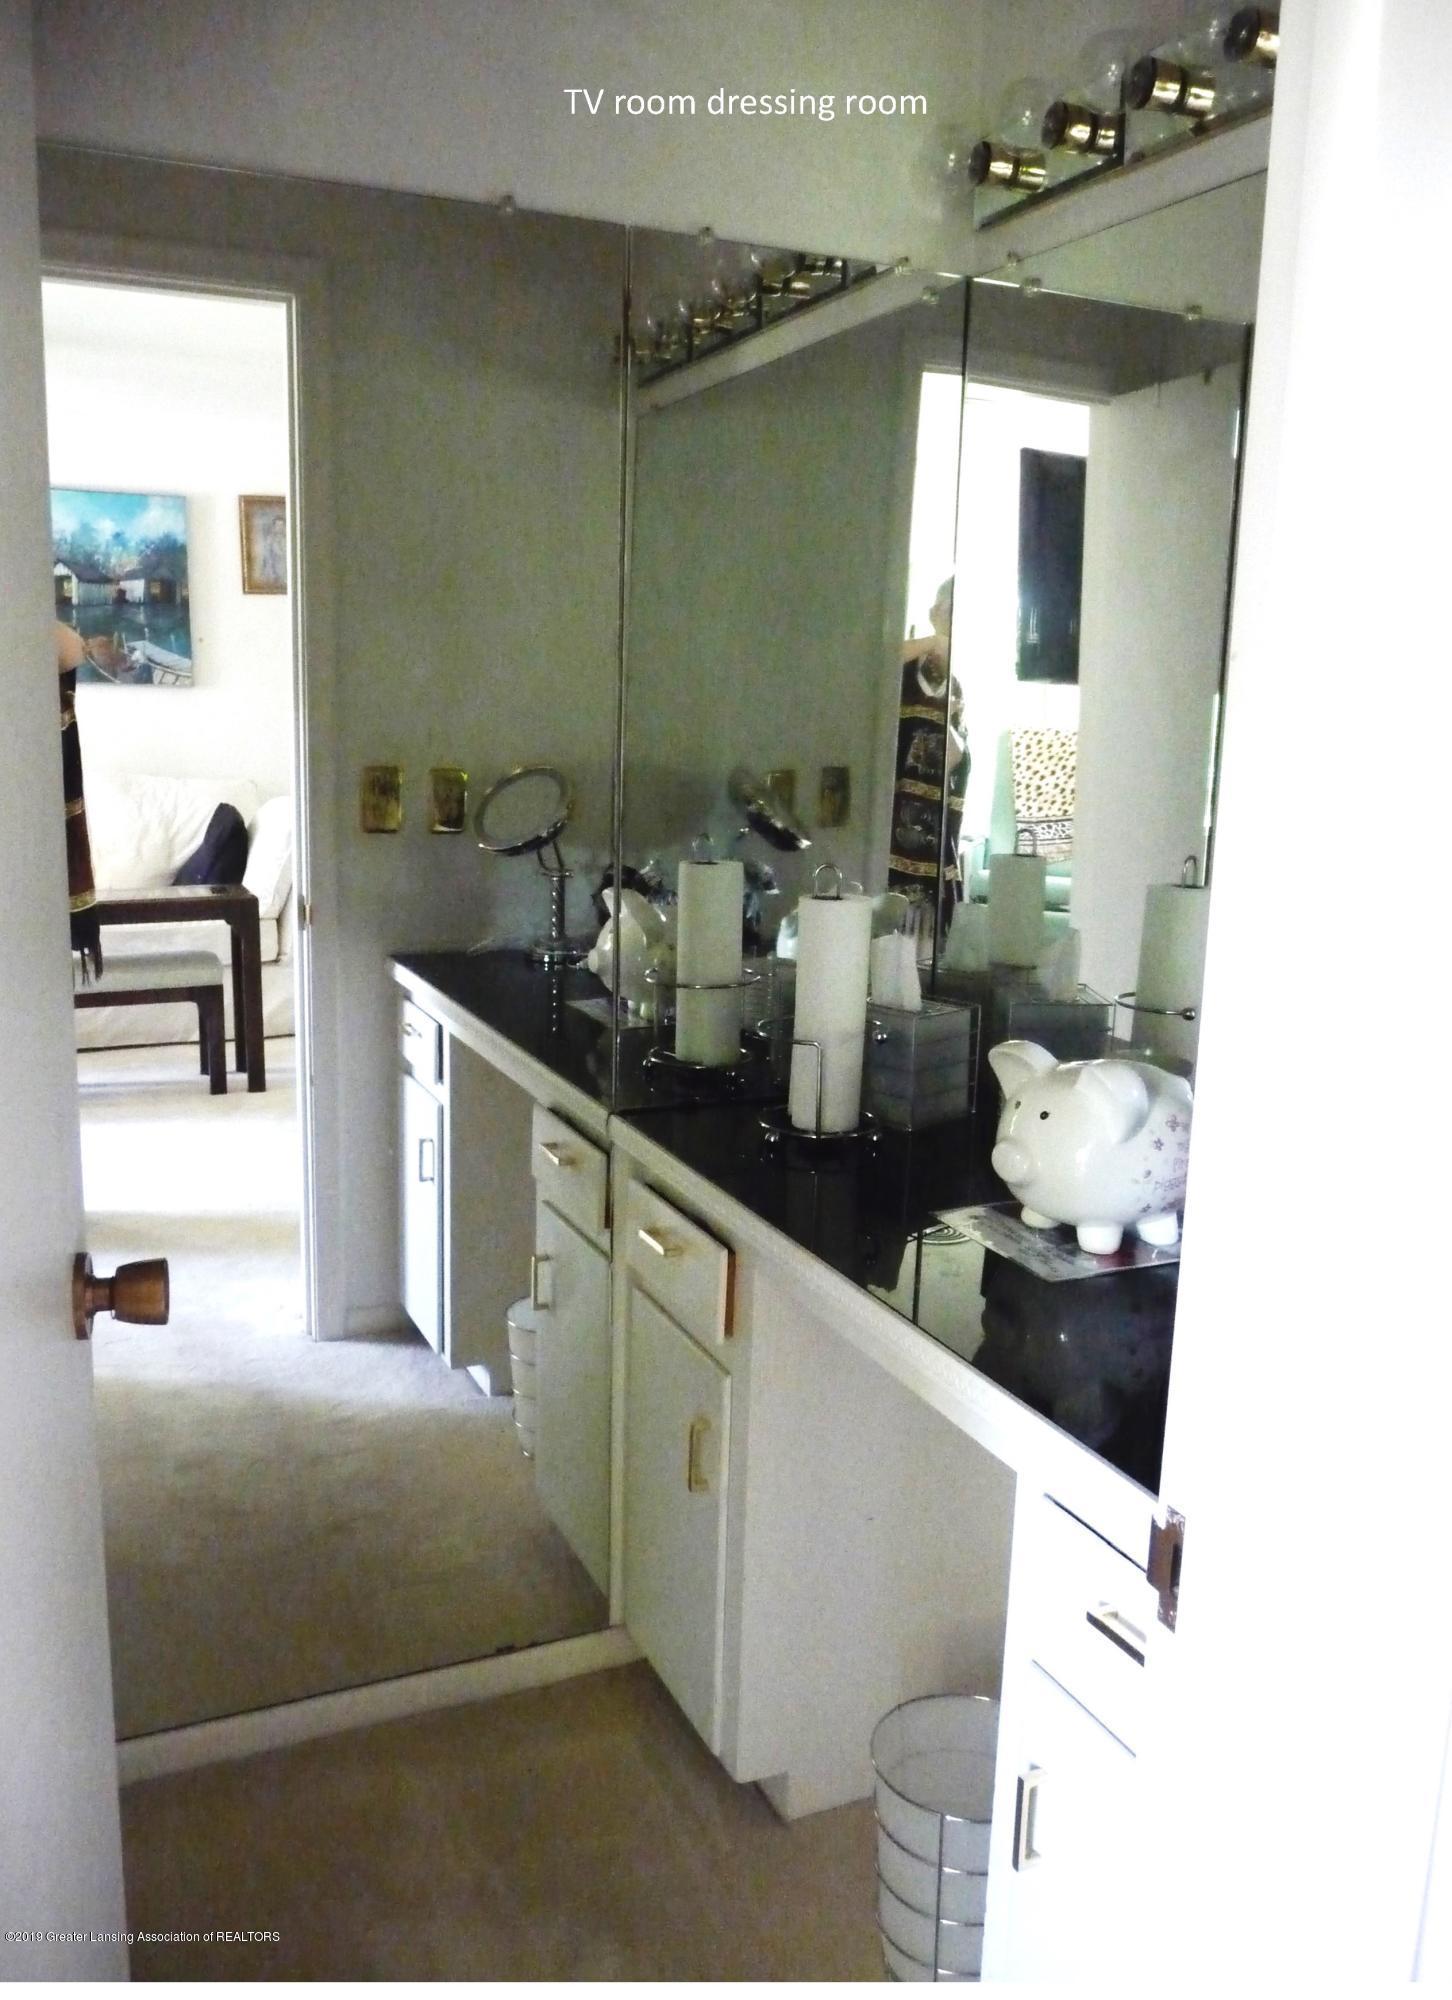 3863 Waverly Hills Rd - TVRoomDressingRoom - 84